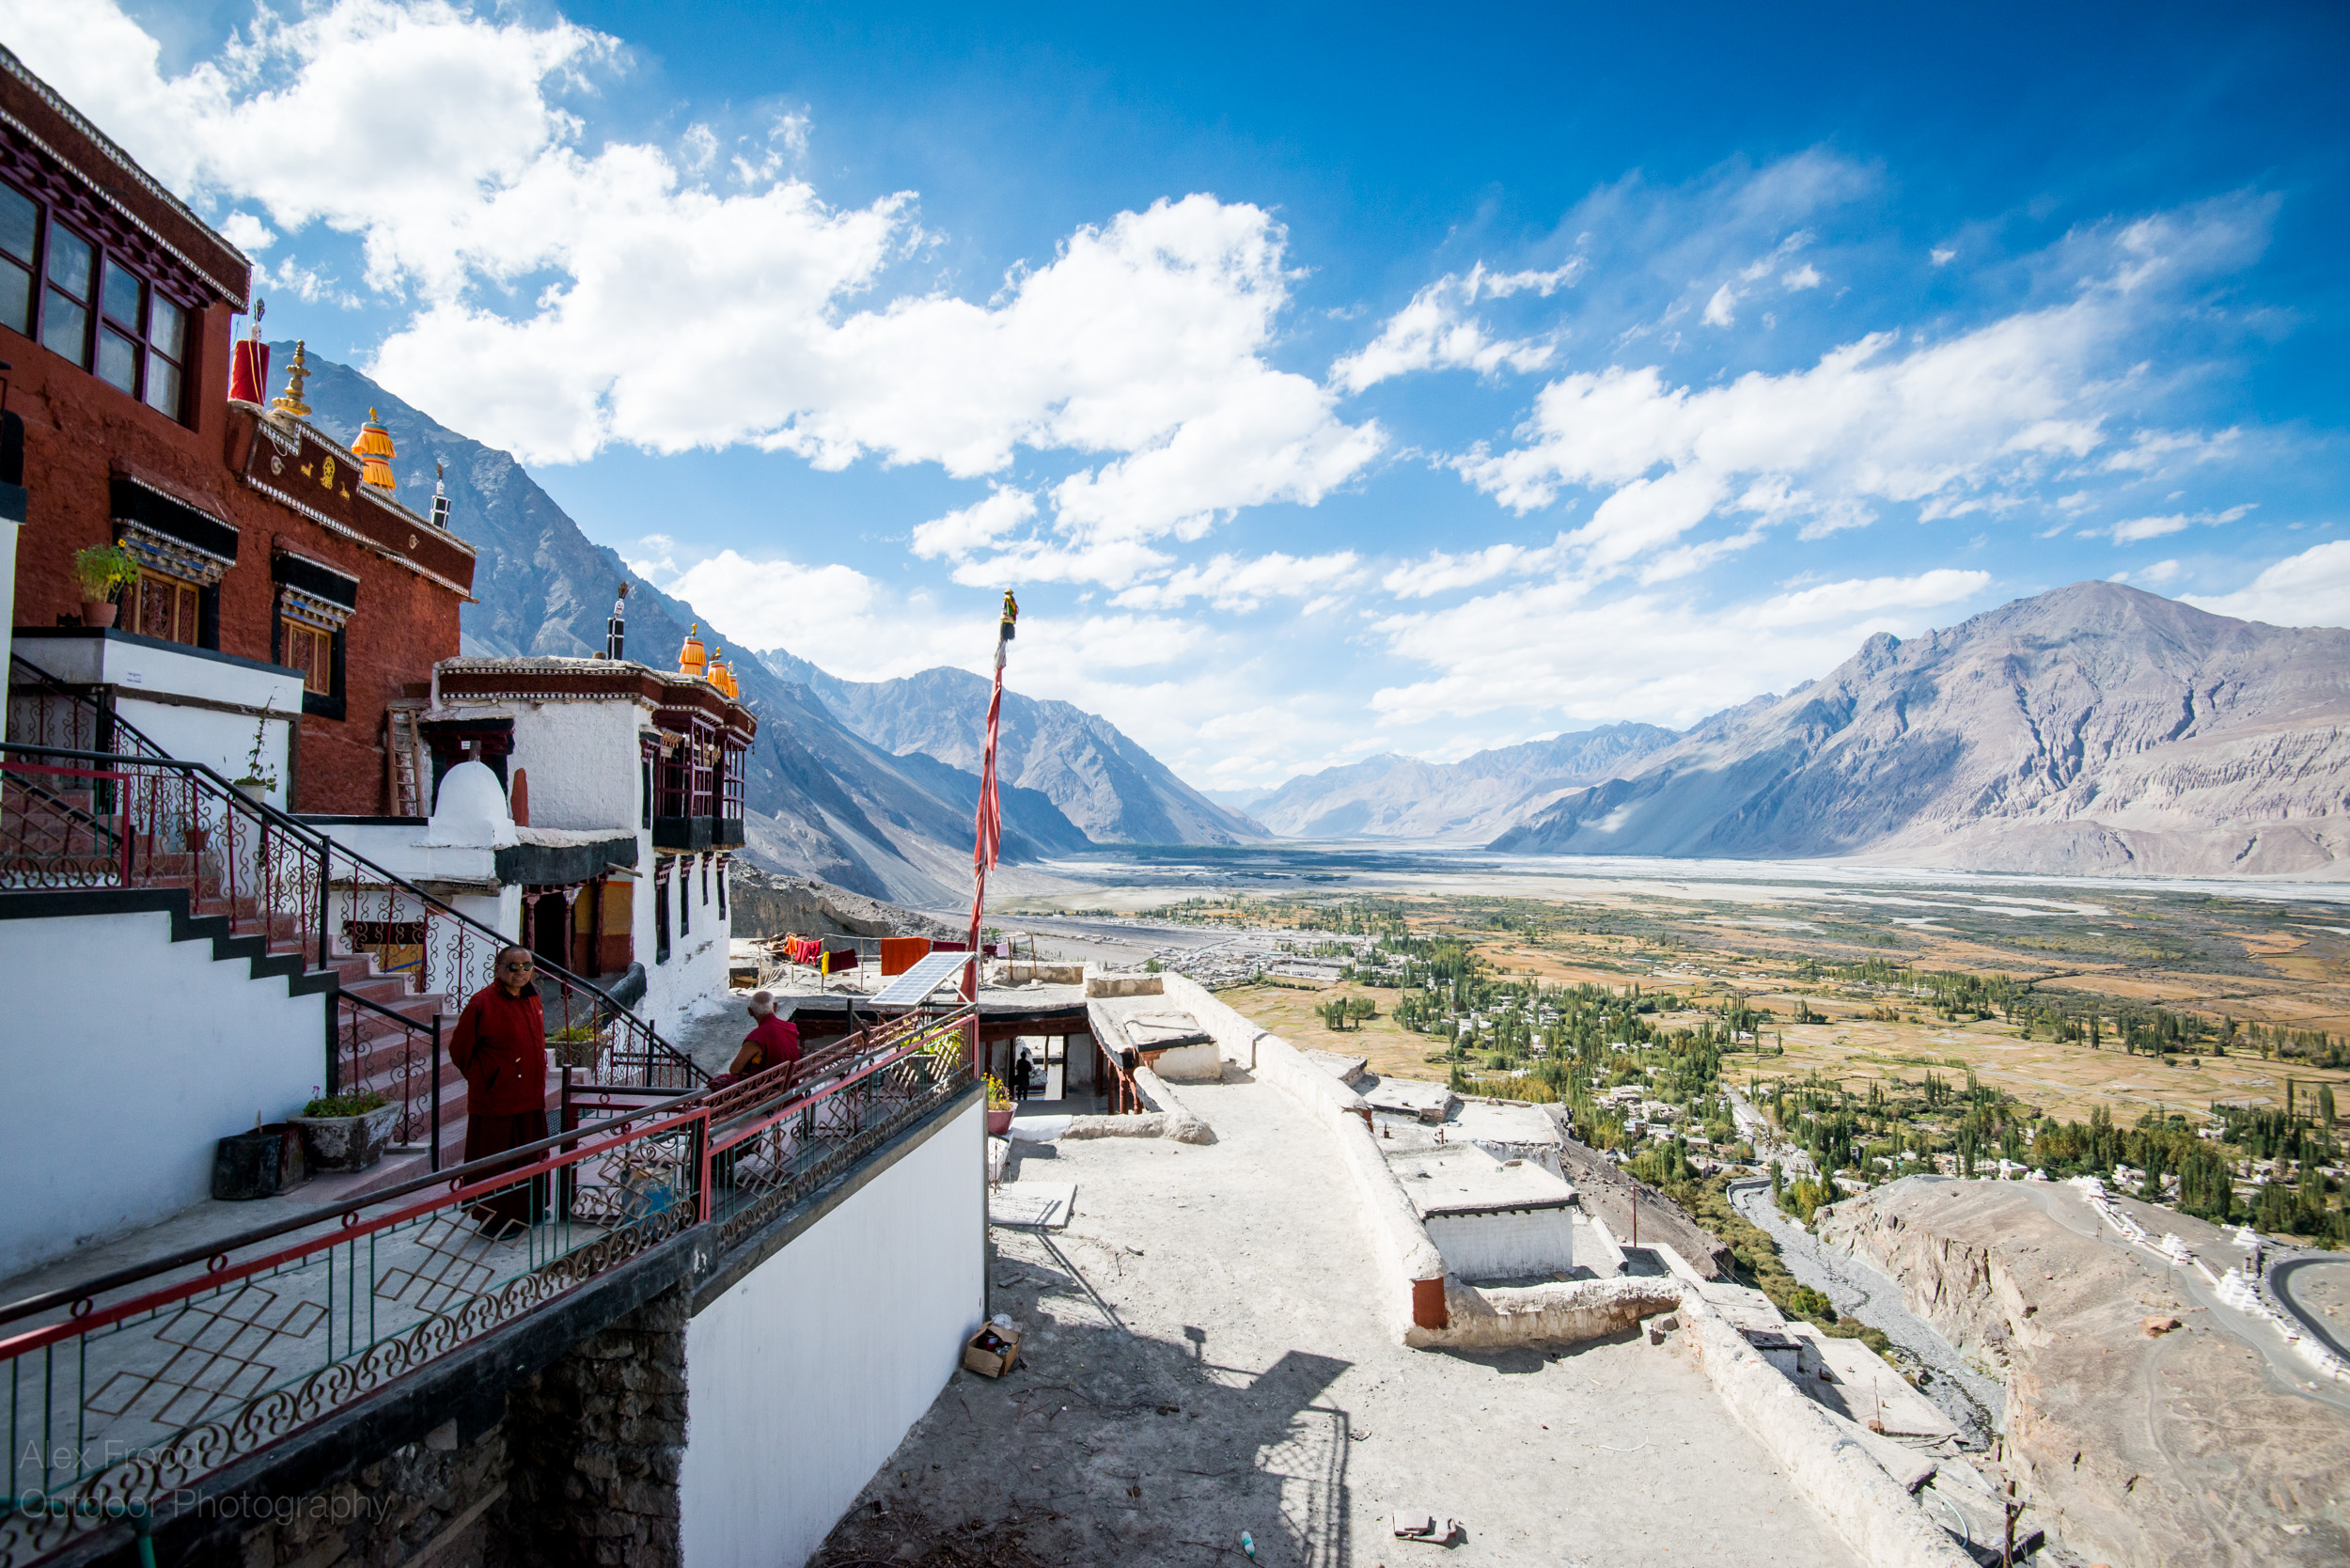 Inida Himalayas-25.jpg